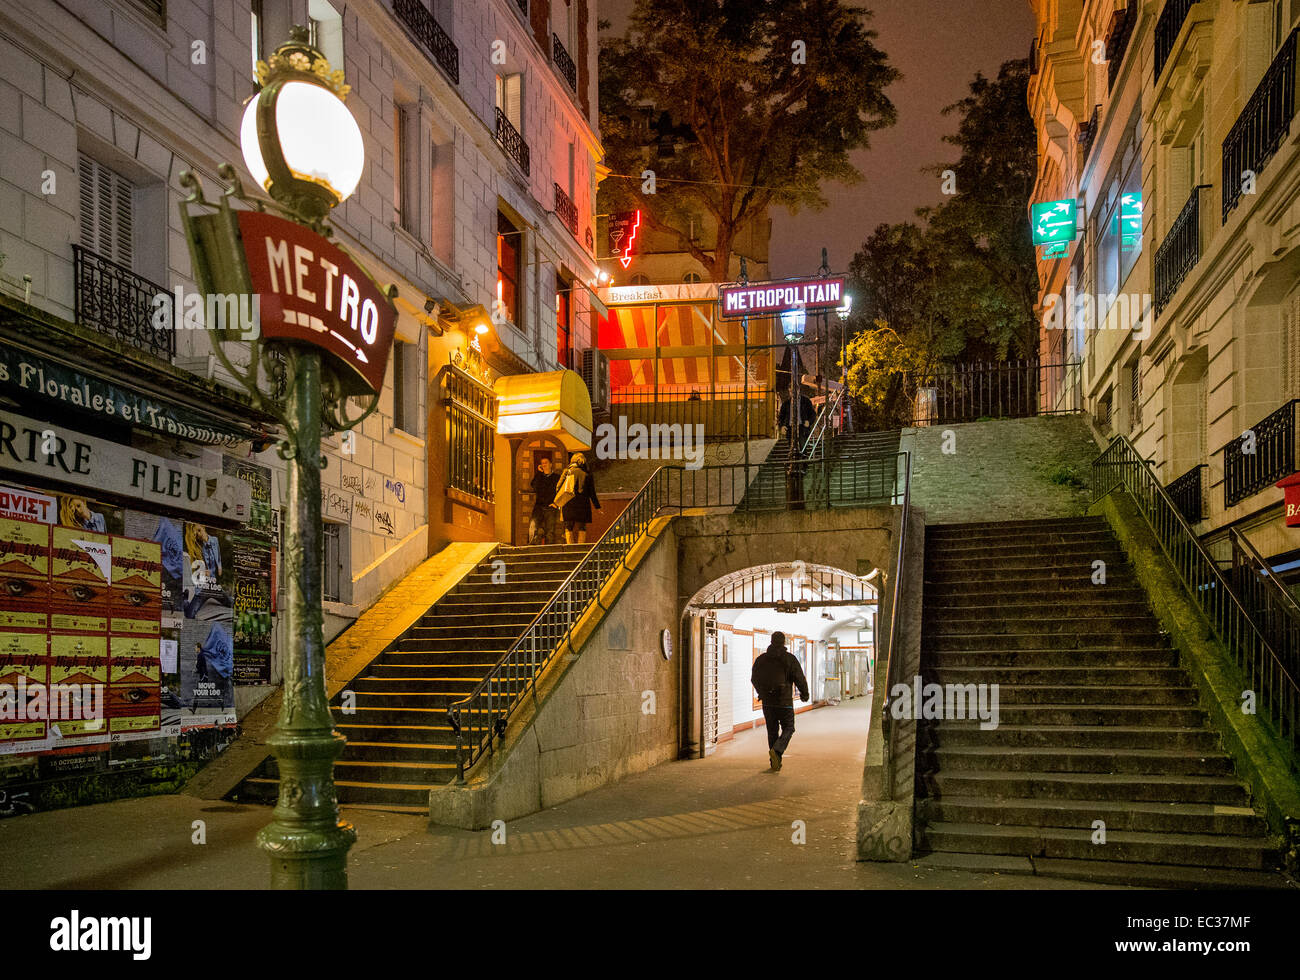 u-Bahn Eingang Montmartre Paris Frankreich Nacht Stockbild